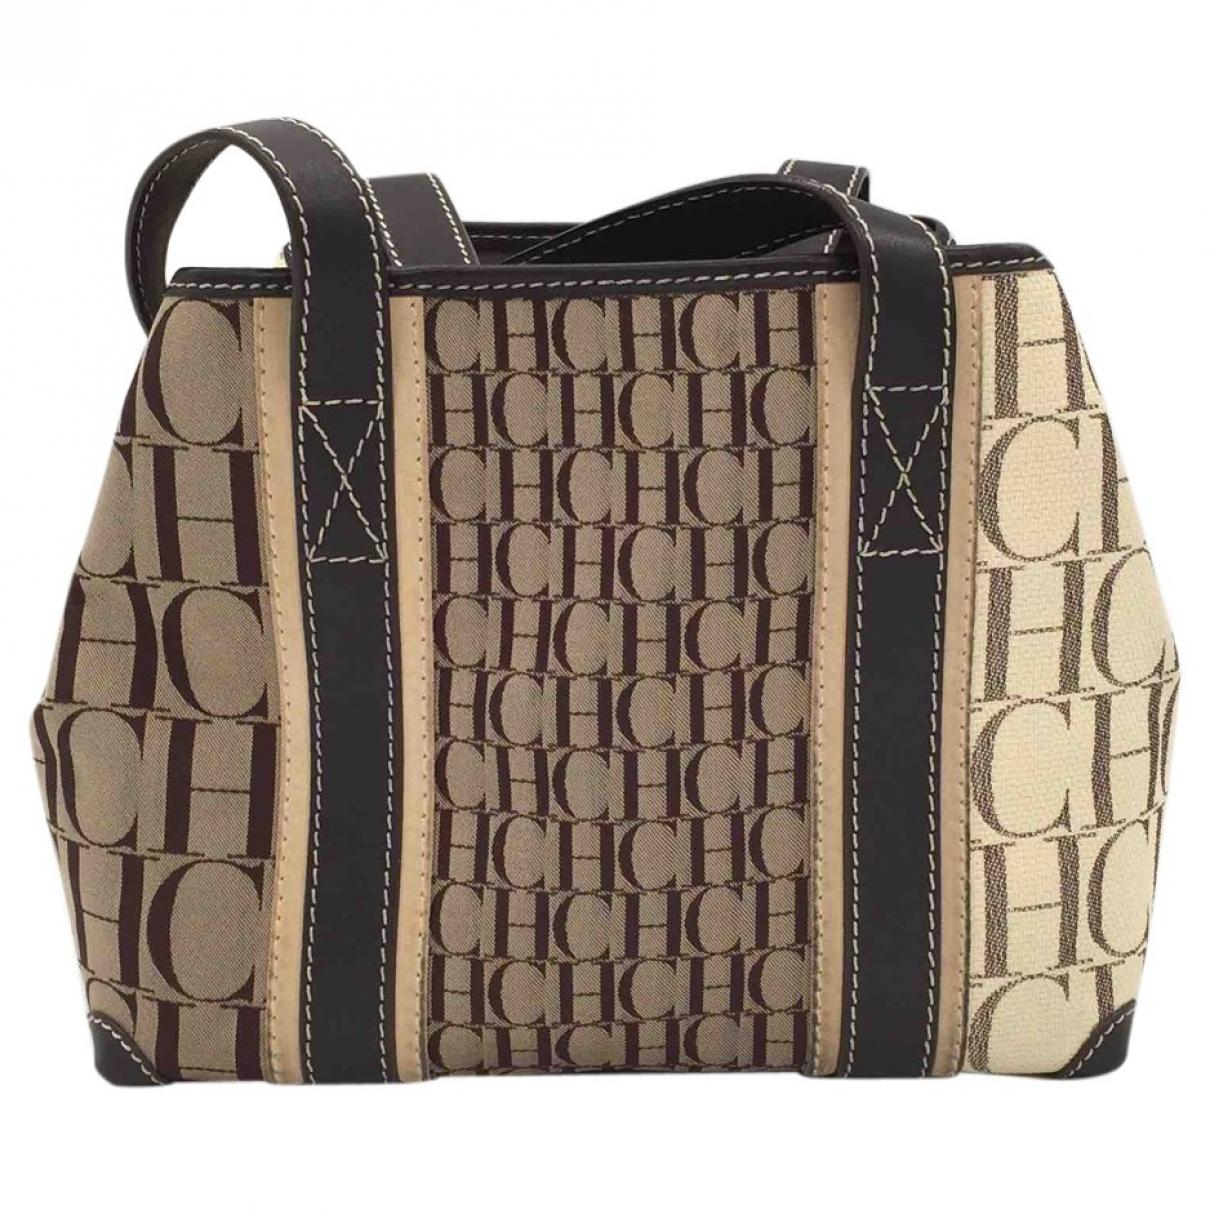 Carolina Herrera \N Camel Leather handbag for Women \N